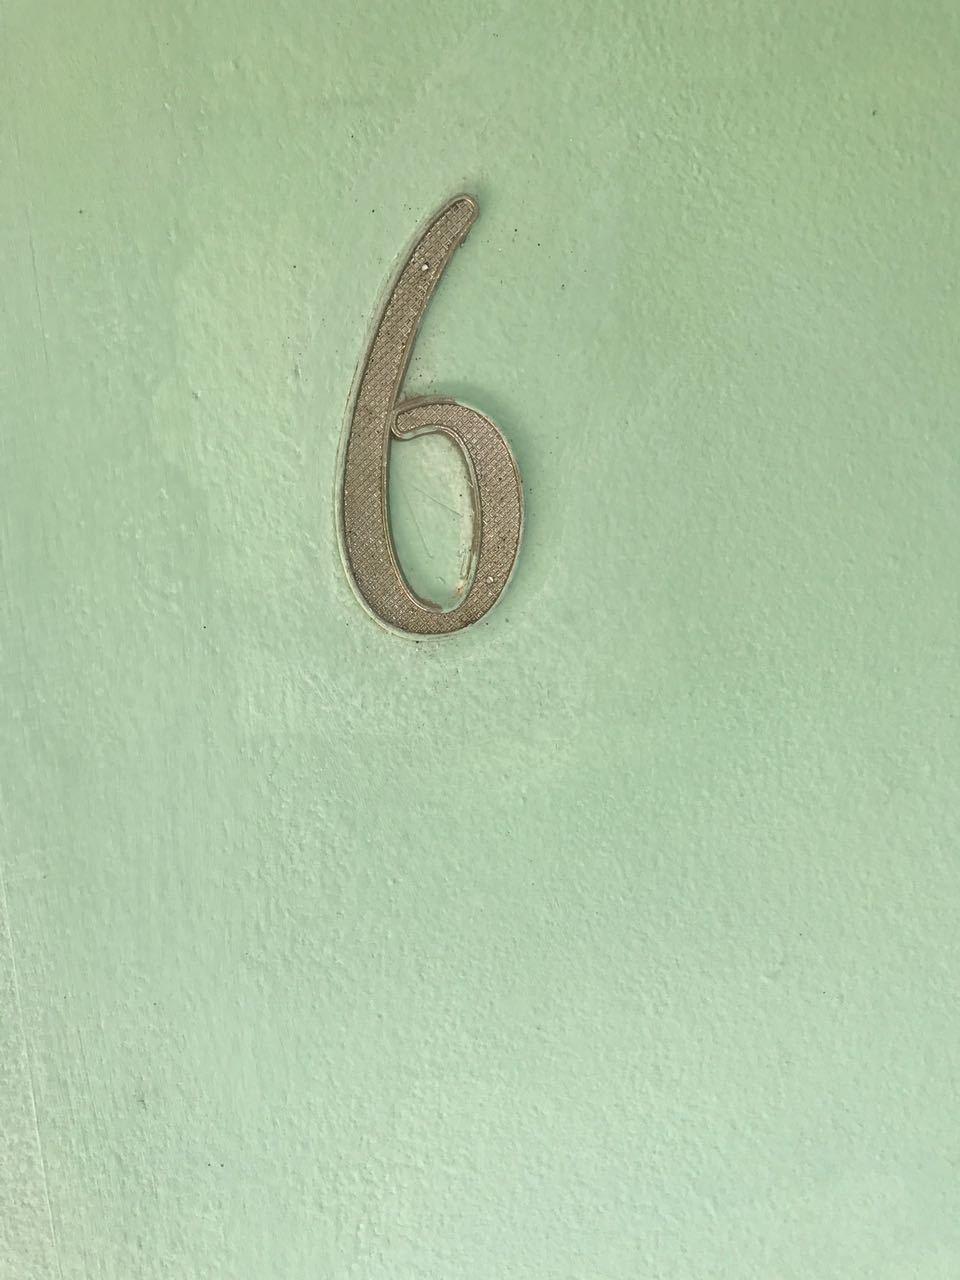 11 of 11